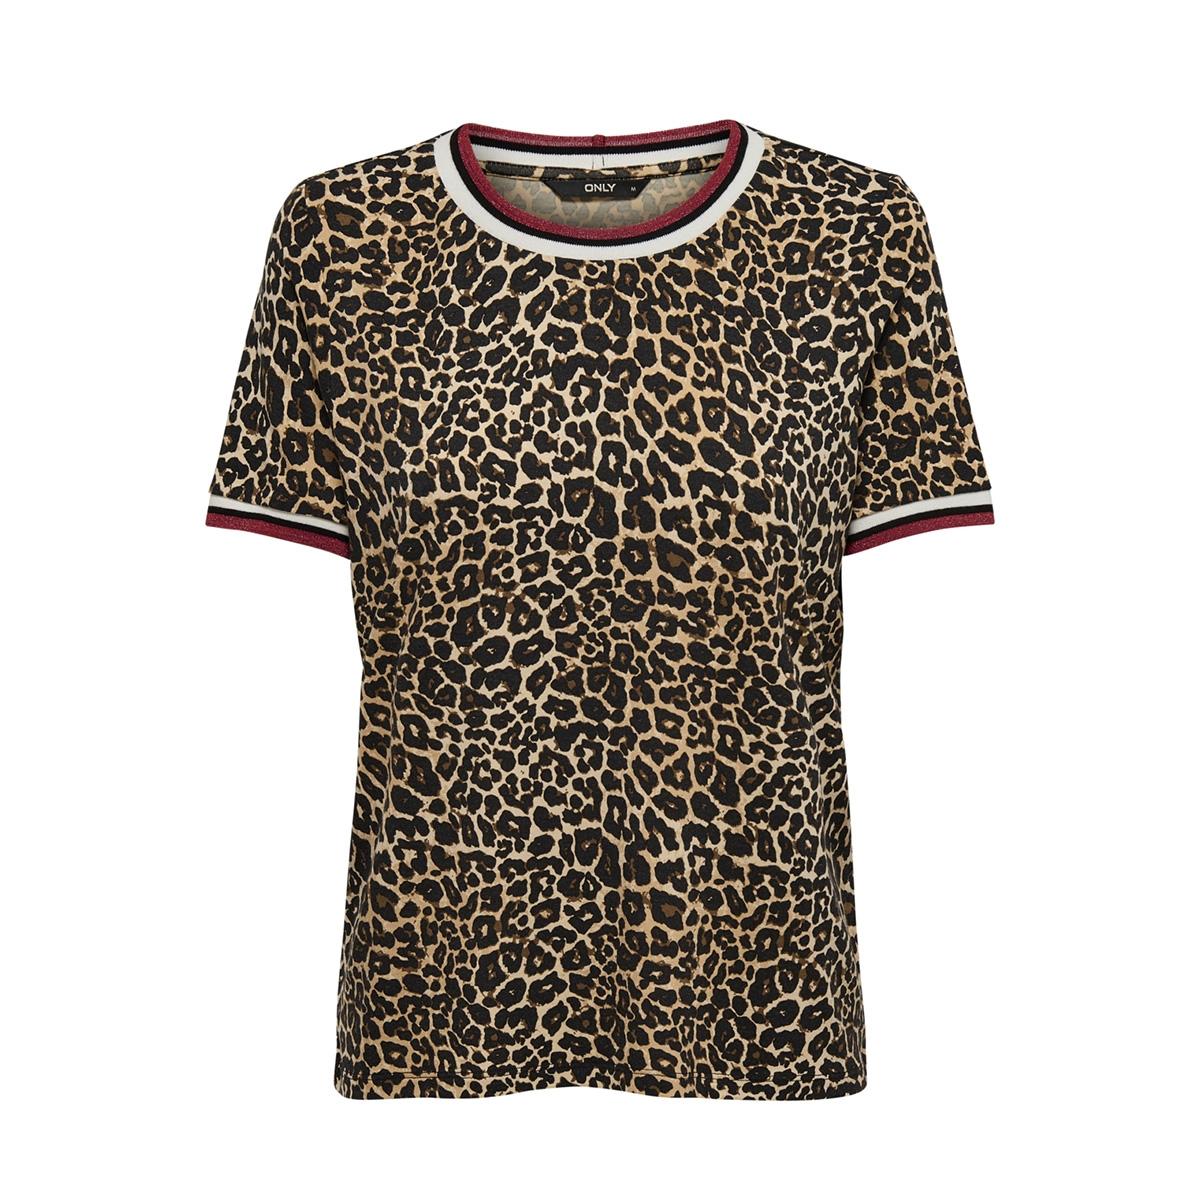 onlsport s/s top jrs 15172389 only t-shirt black/goji berry